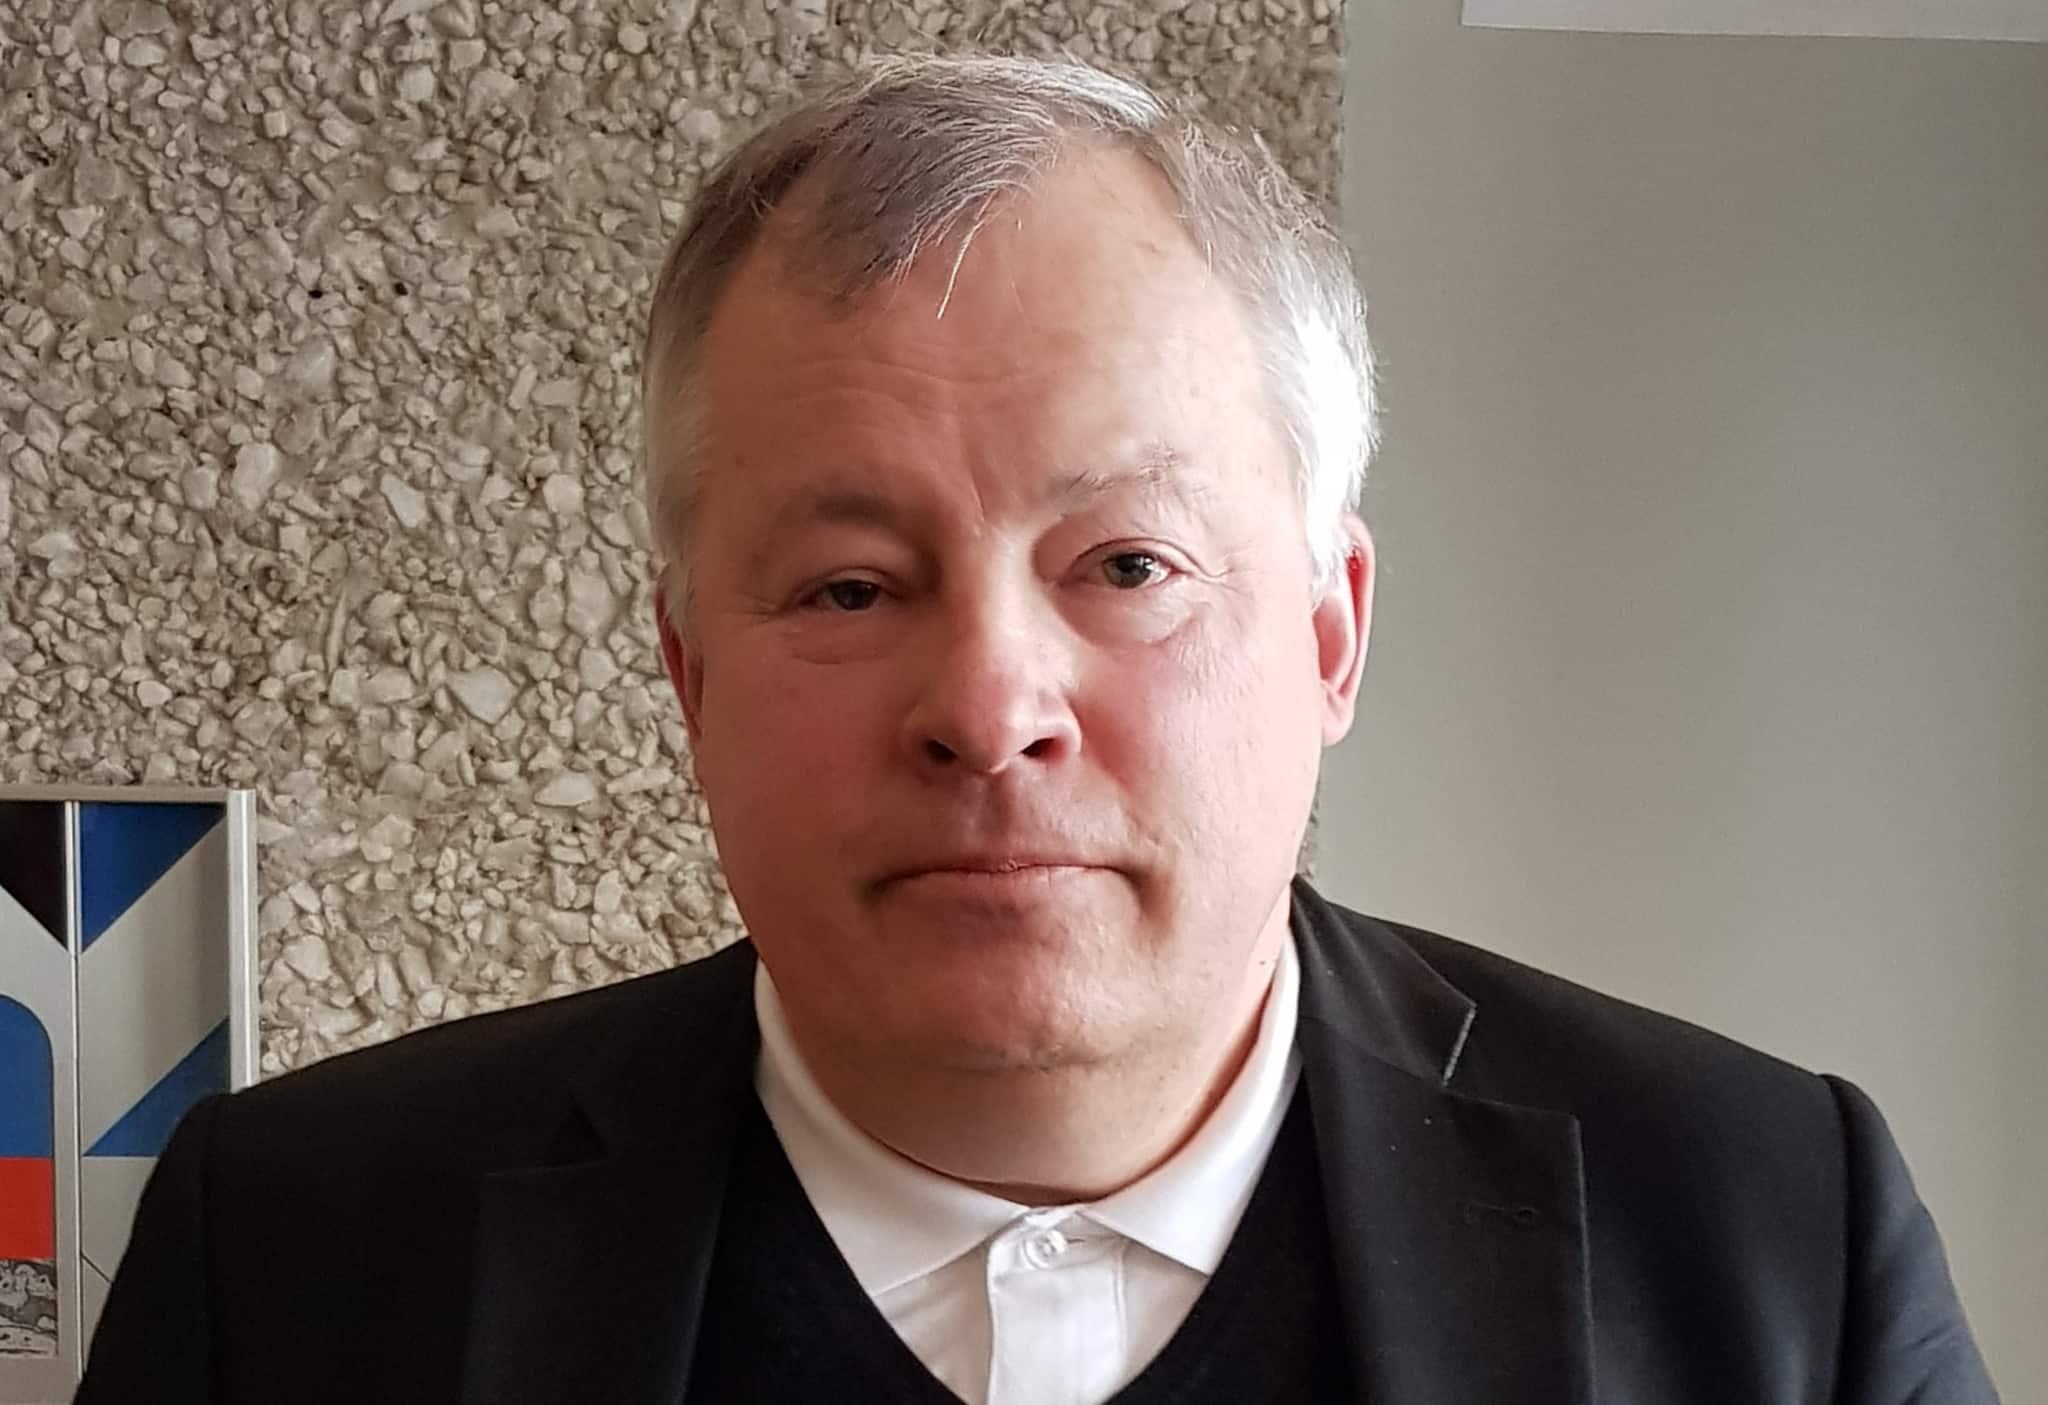 Miljöåklagare Christer B Jarlås.